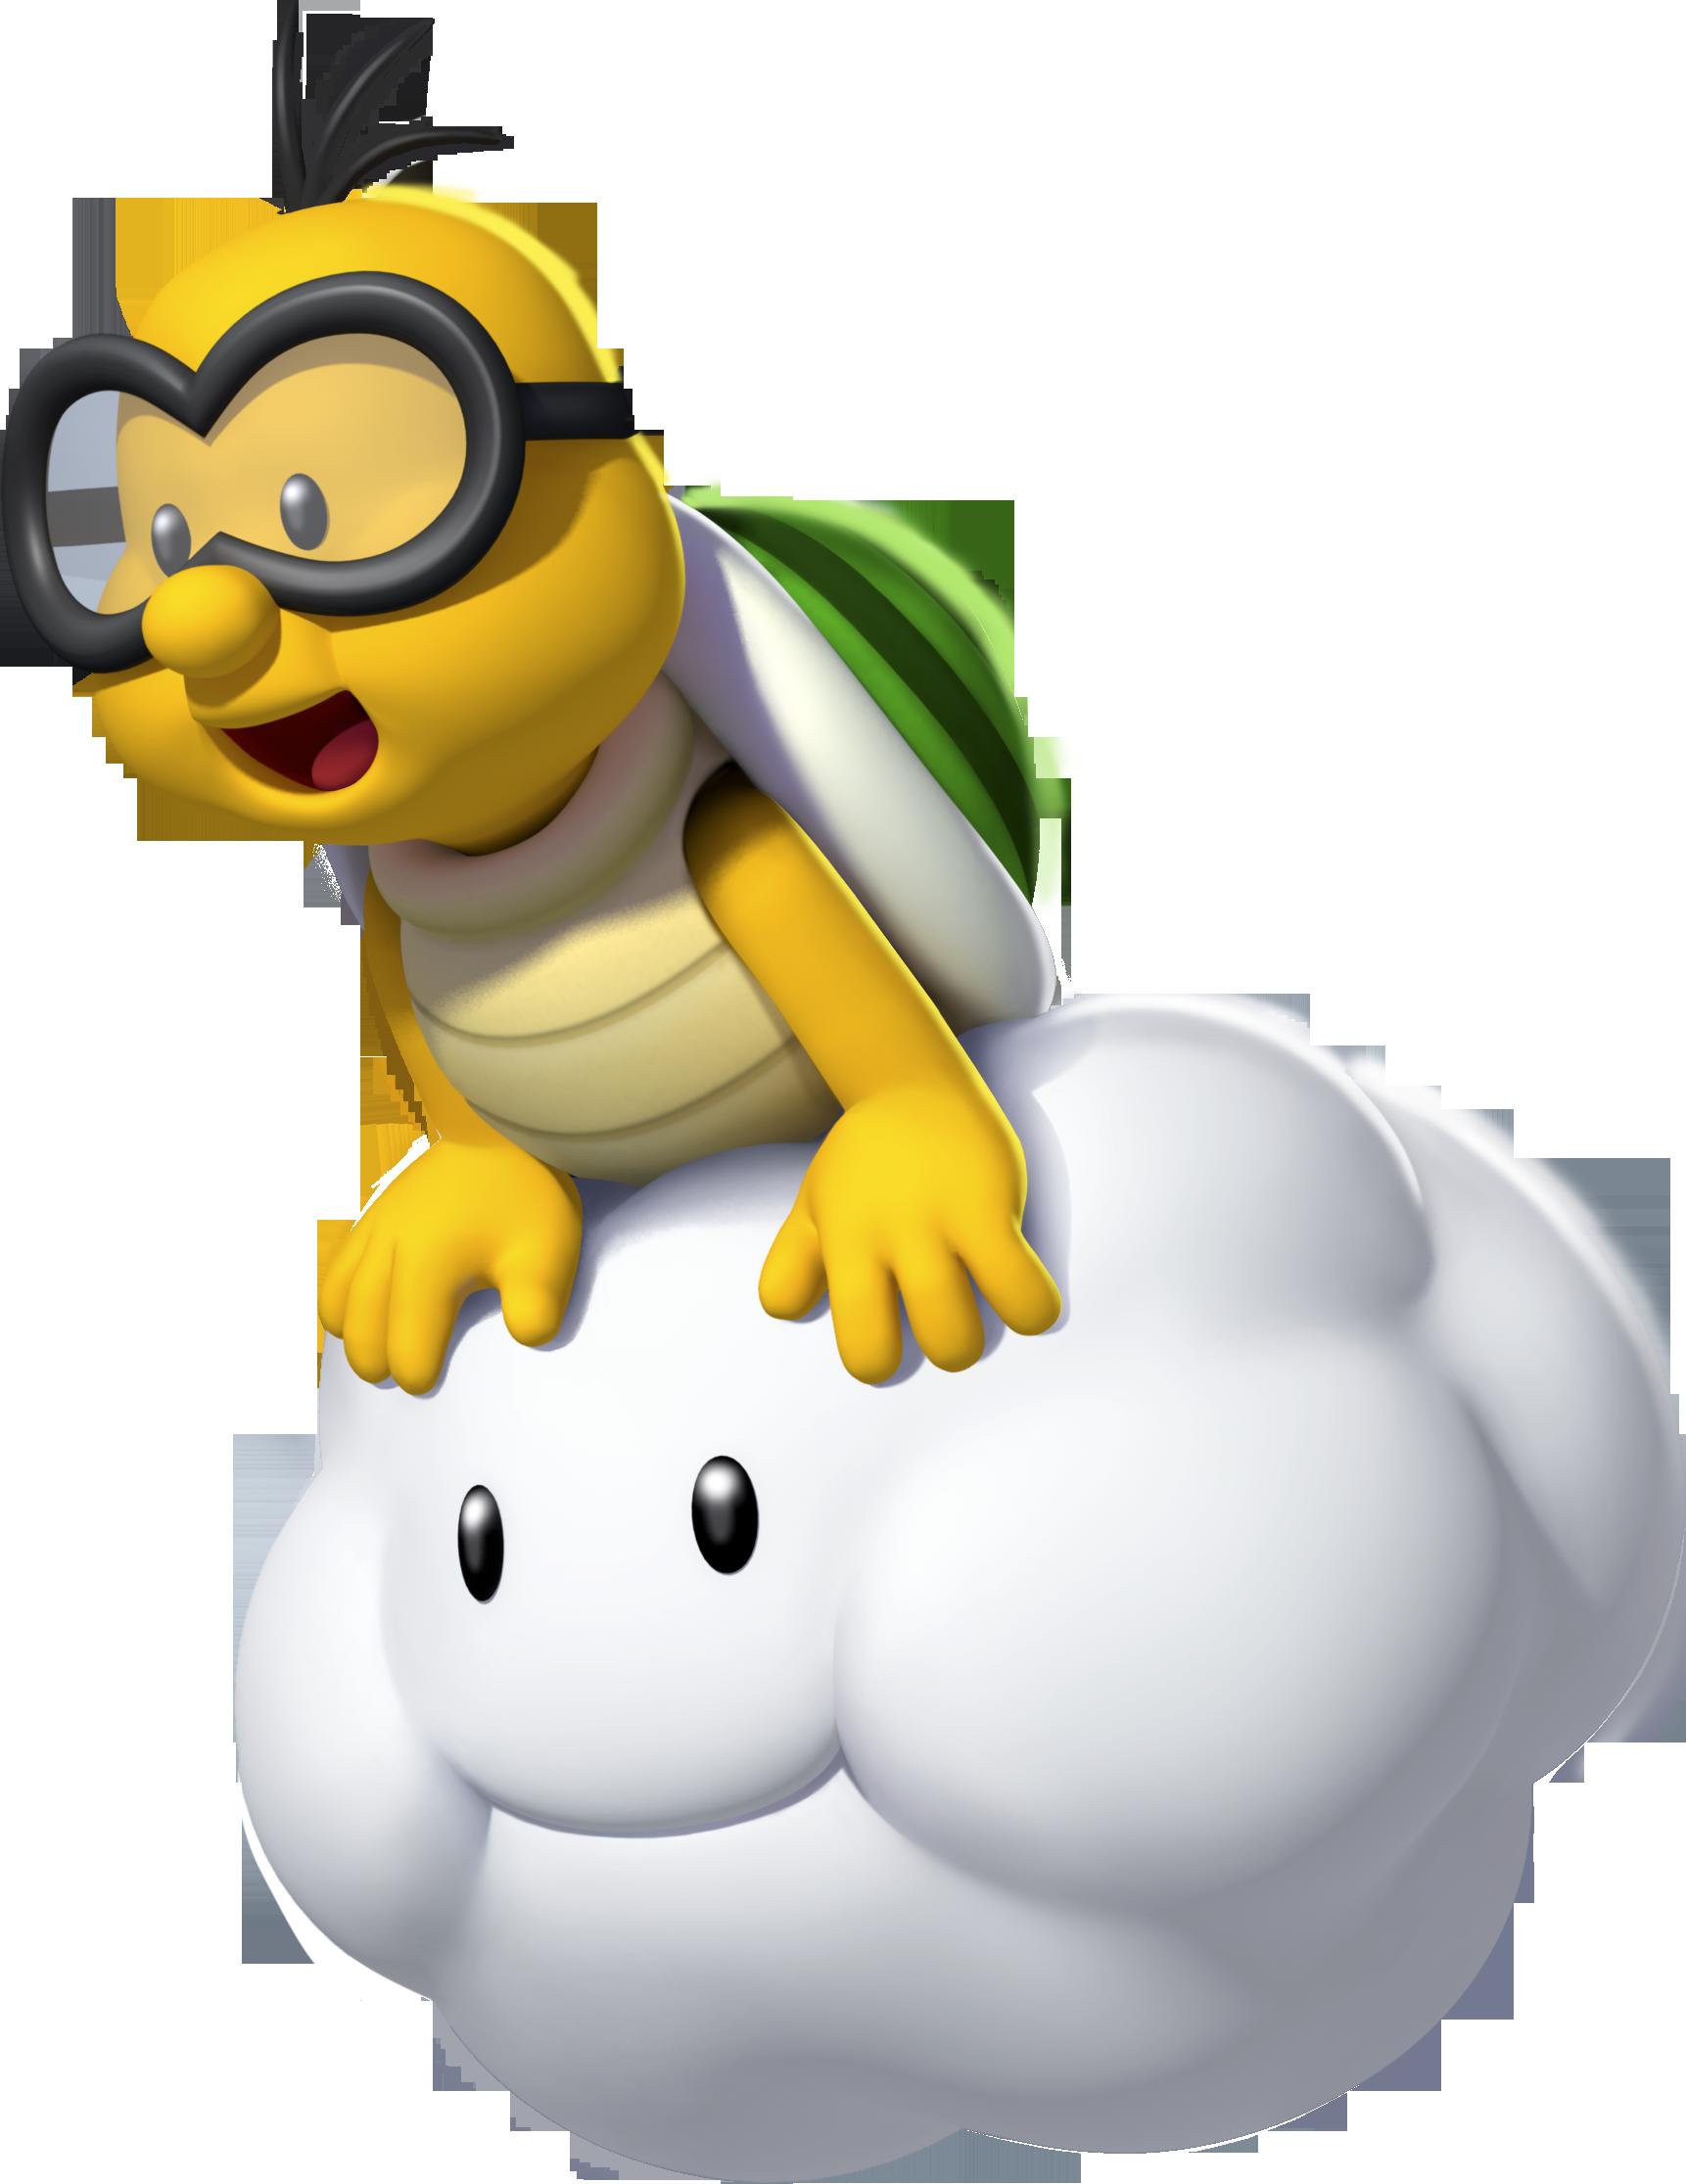 Lakitu | Super Smash Bros Infinity Wikia | FANDOM powered by Wikia